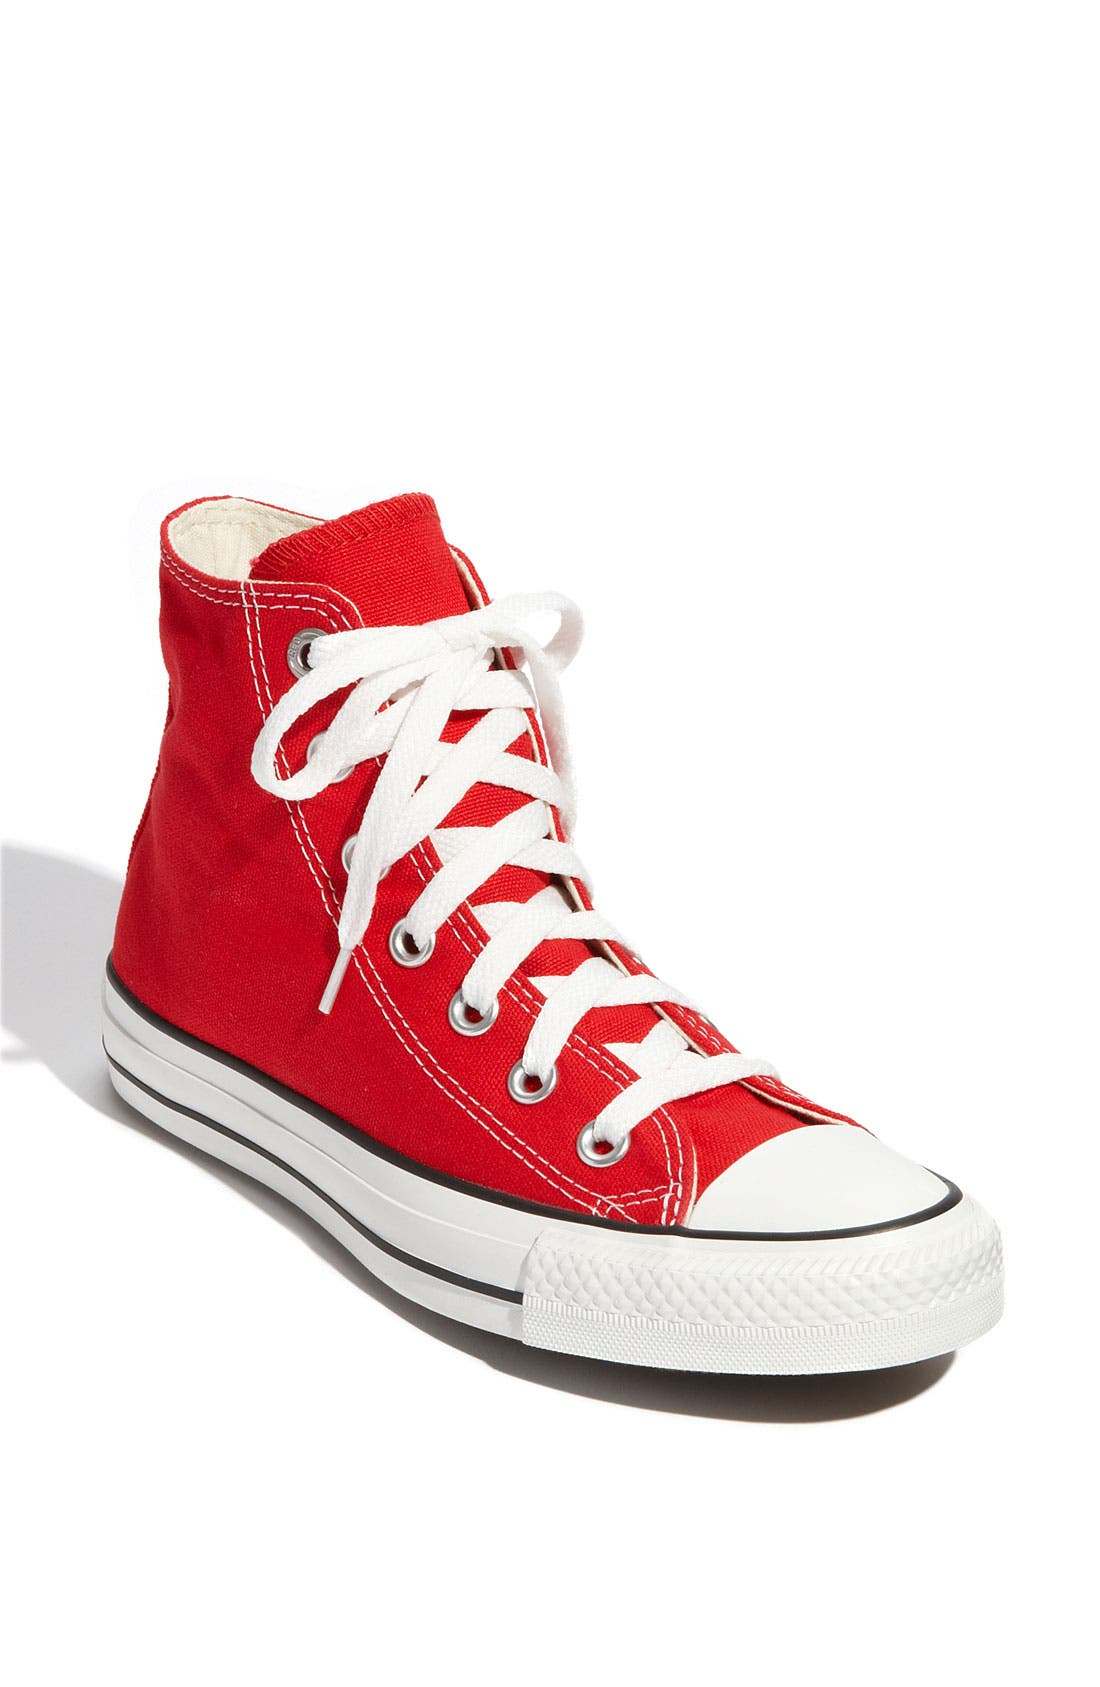 Converse Sneakers CHUCK TAYLOR HIGH TOP SNEAKER